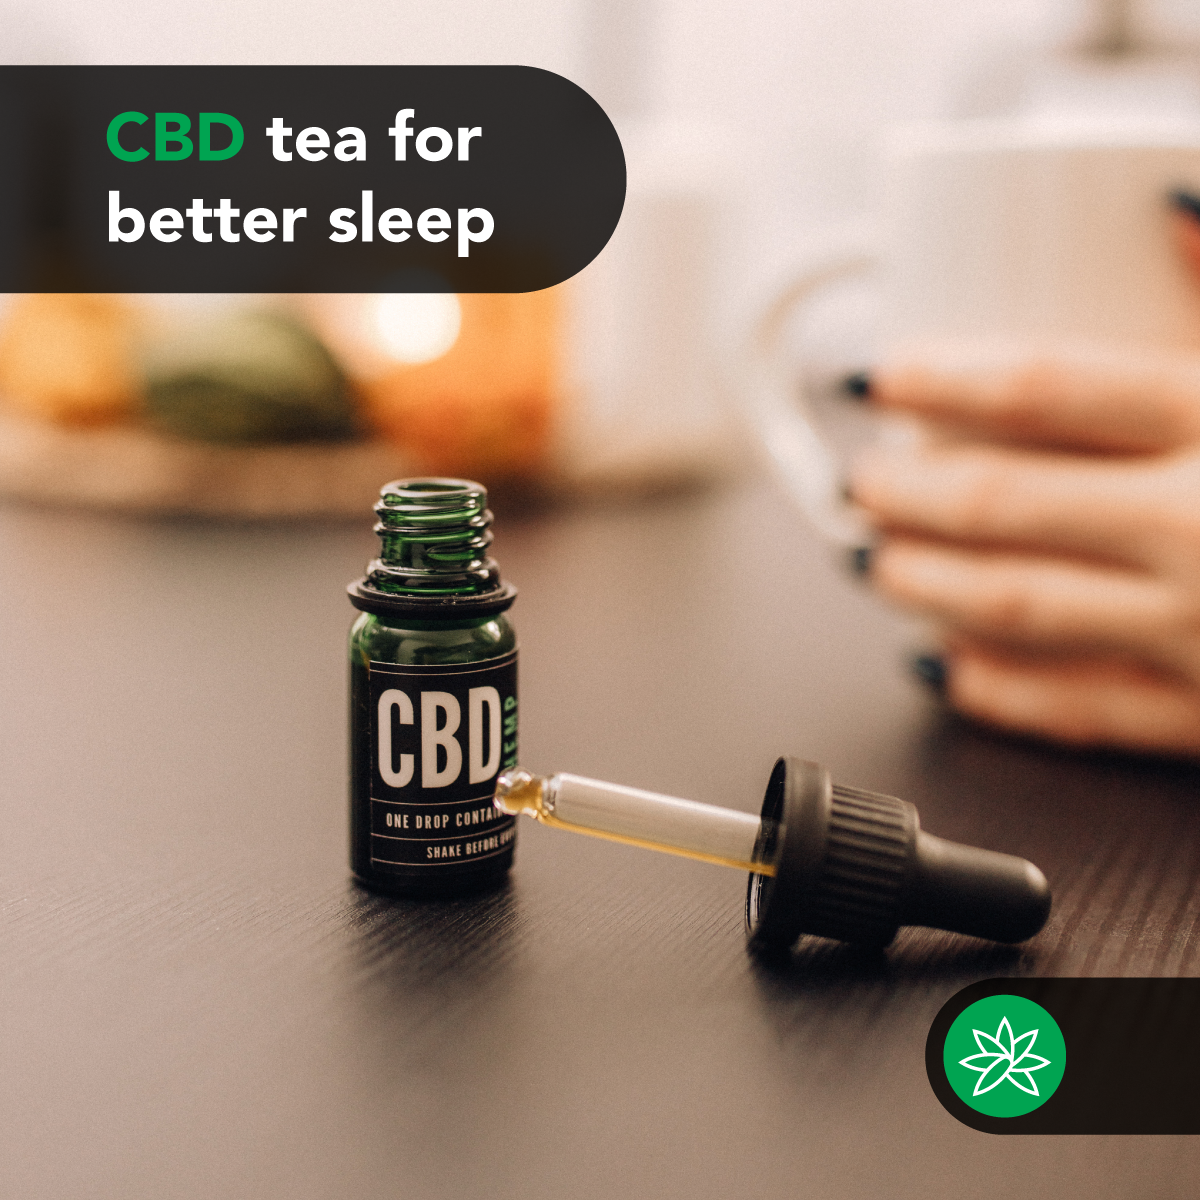 CBD tea for better sleep